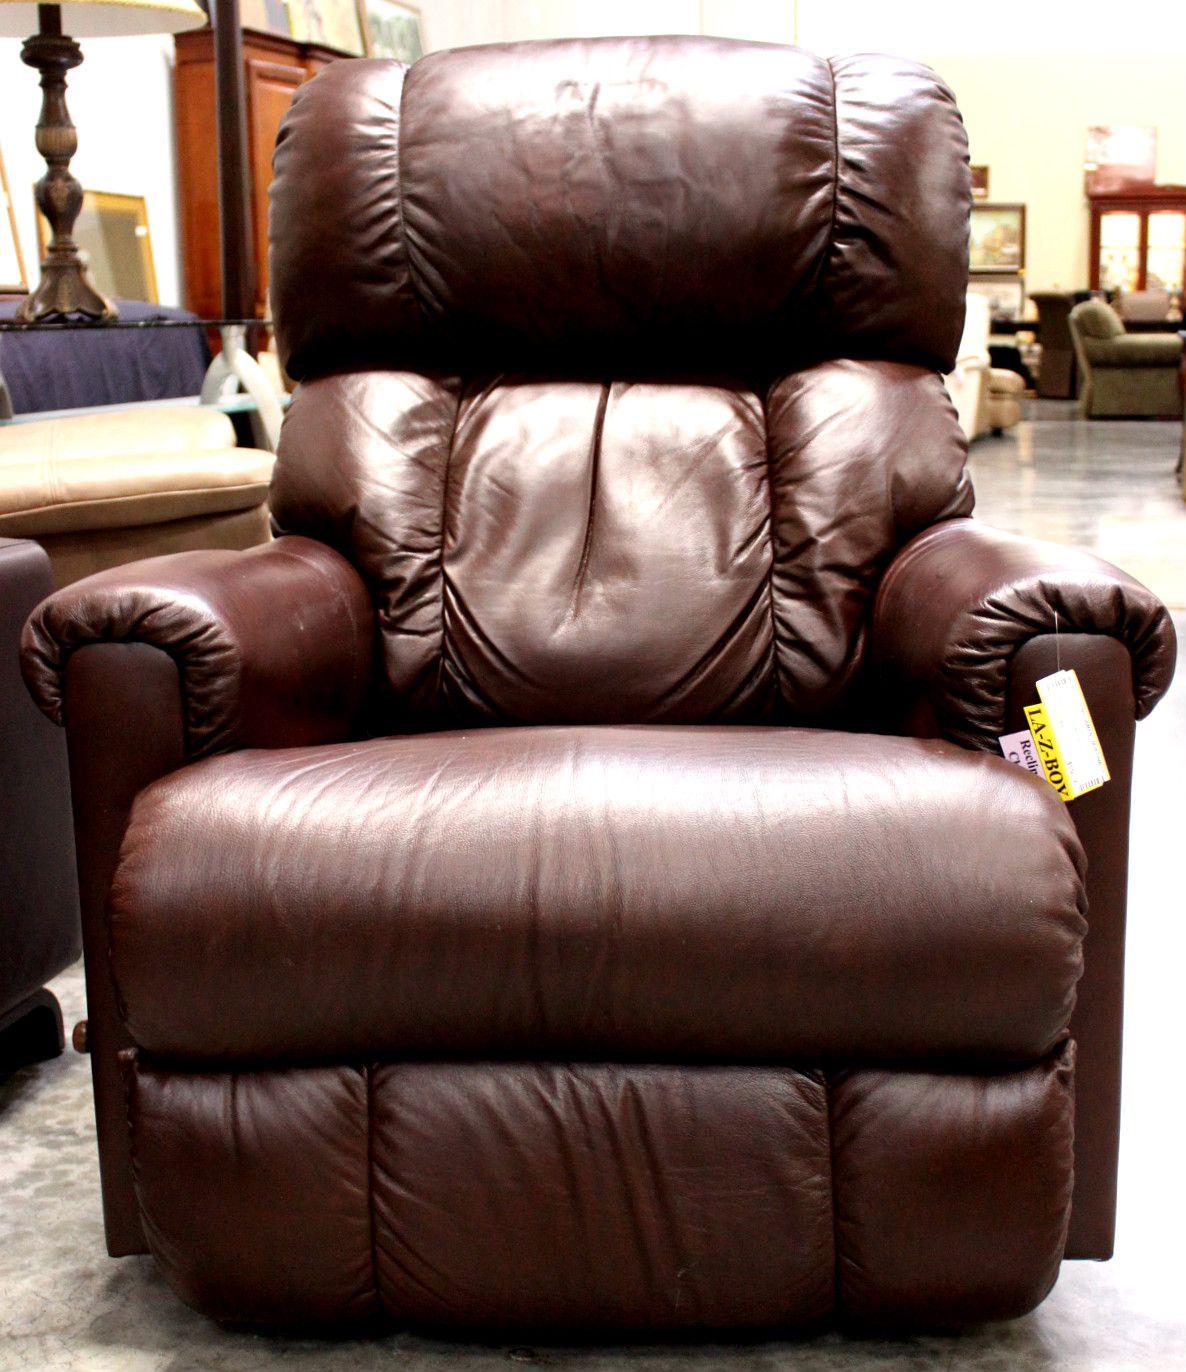 La-Z-Boy Chestnut brown Leather